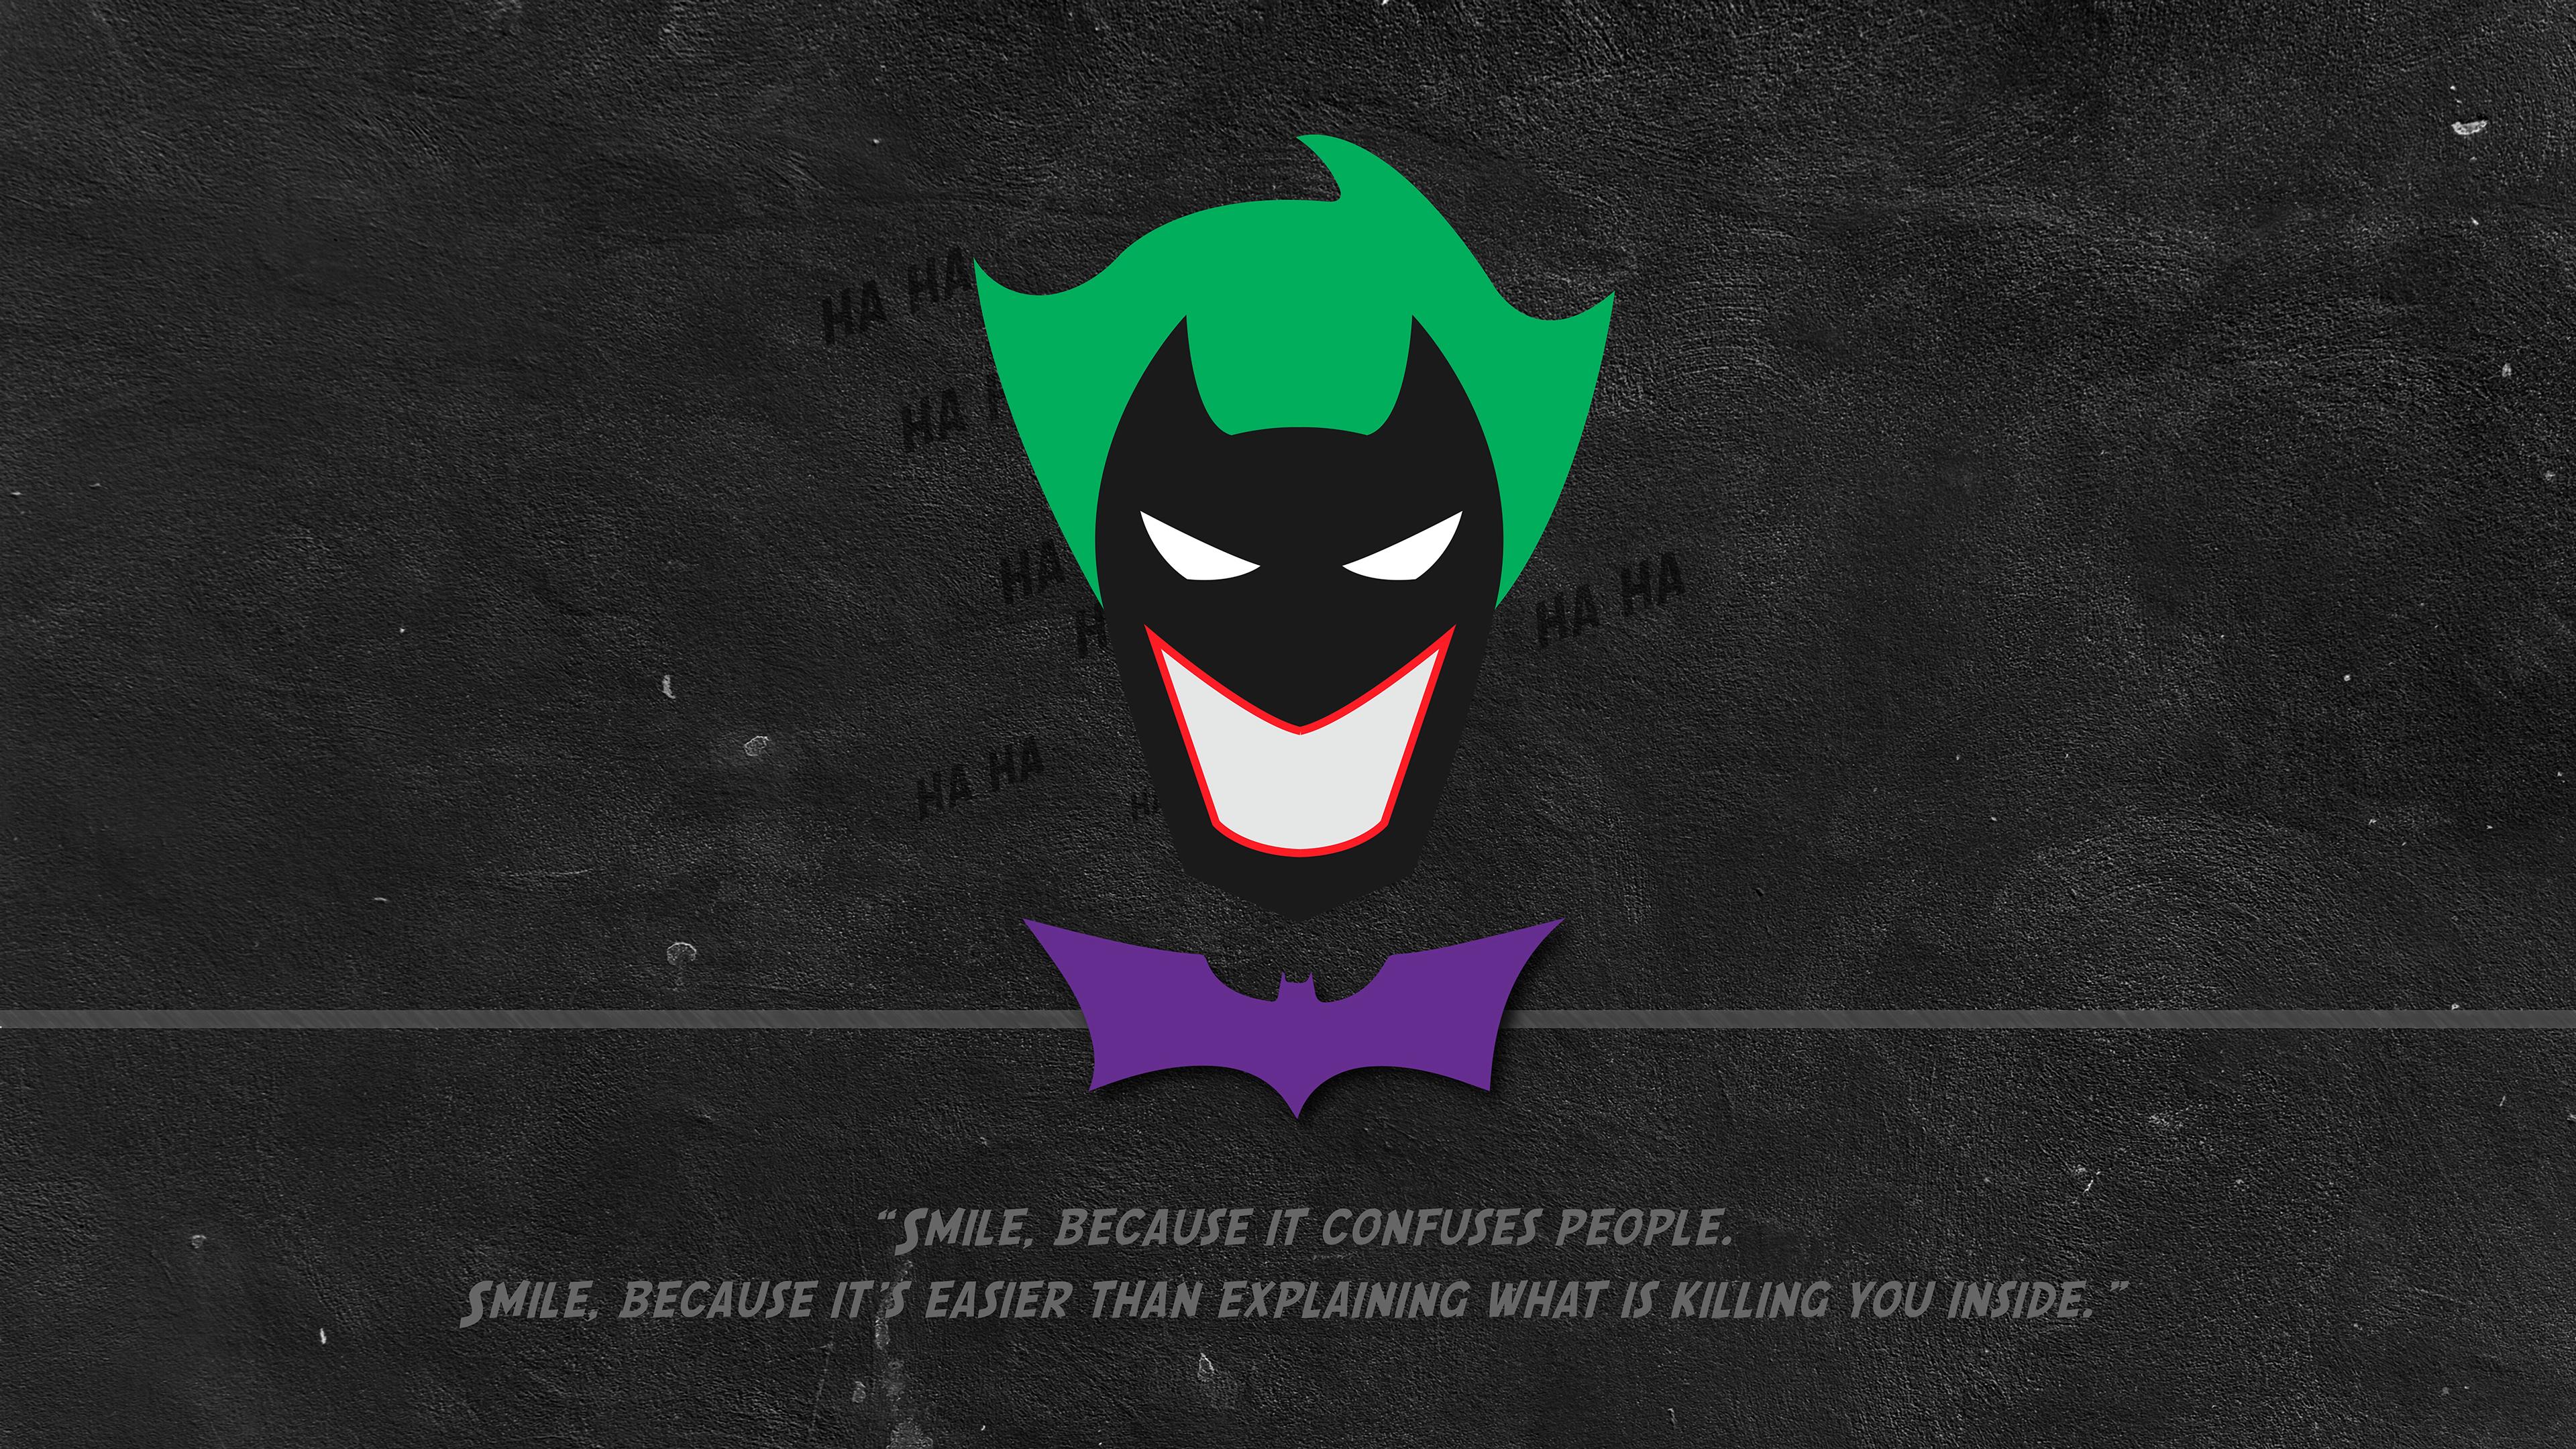 batman joker minimal typography 1568055239 - Batman Joker Minimal Typography - typography wallpapers, superheroes wallpapers, logo wallpapers, joker wallpapers, hd-wallpapers, behance wallpapers, batman wallpapers, 4k-wallpapers